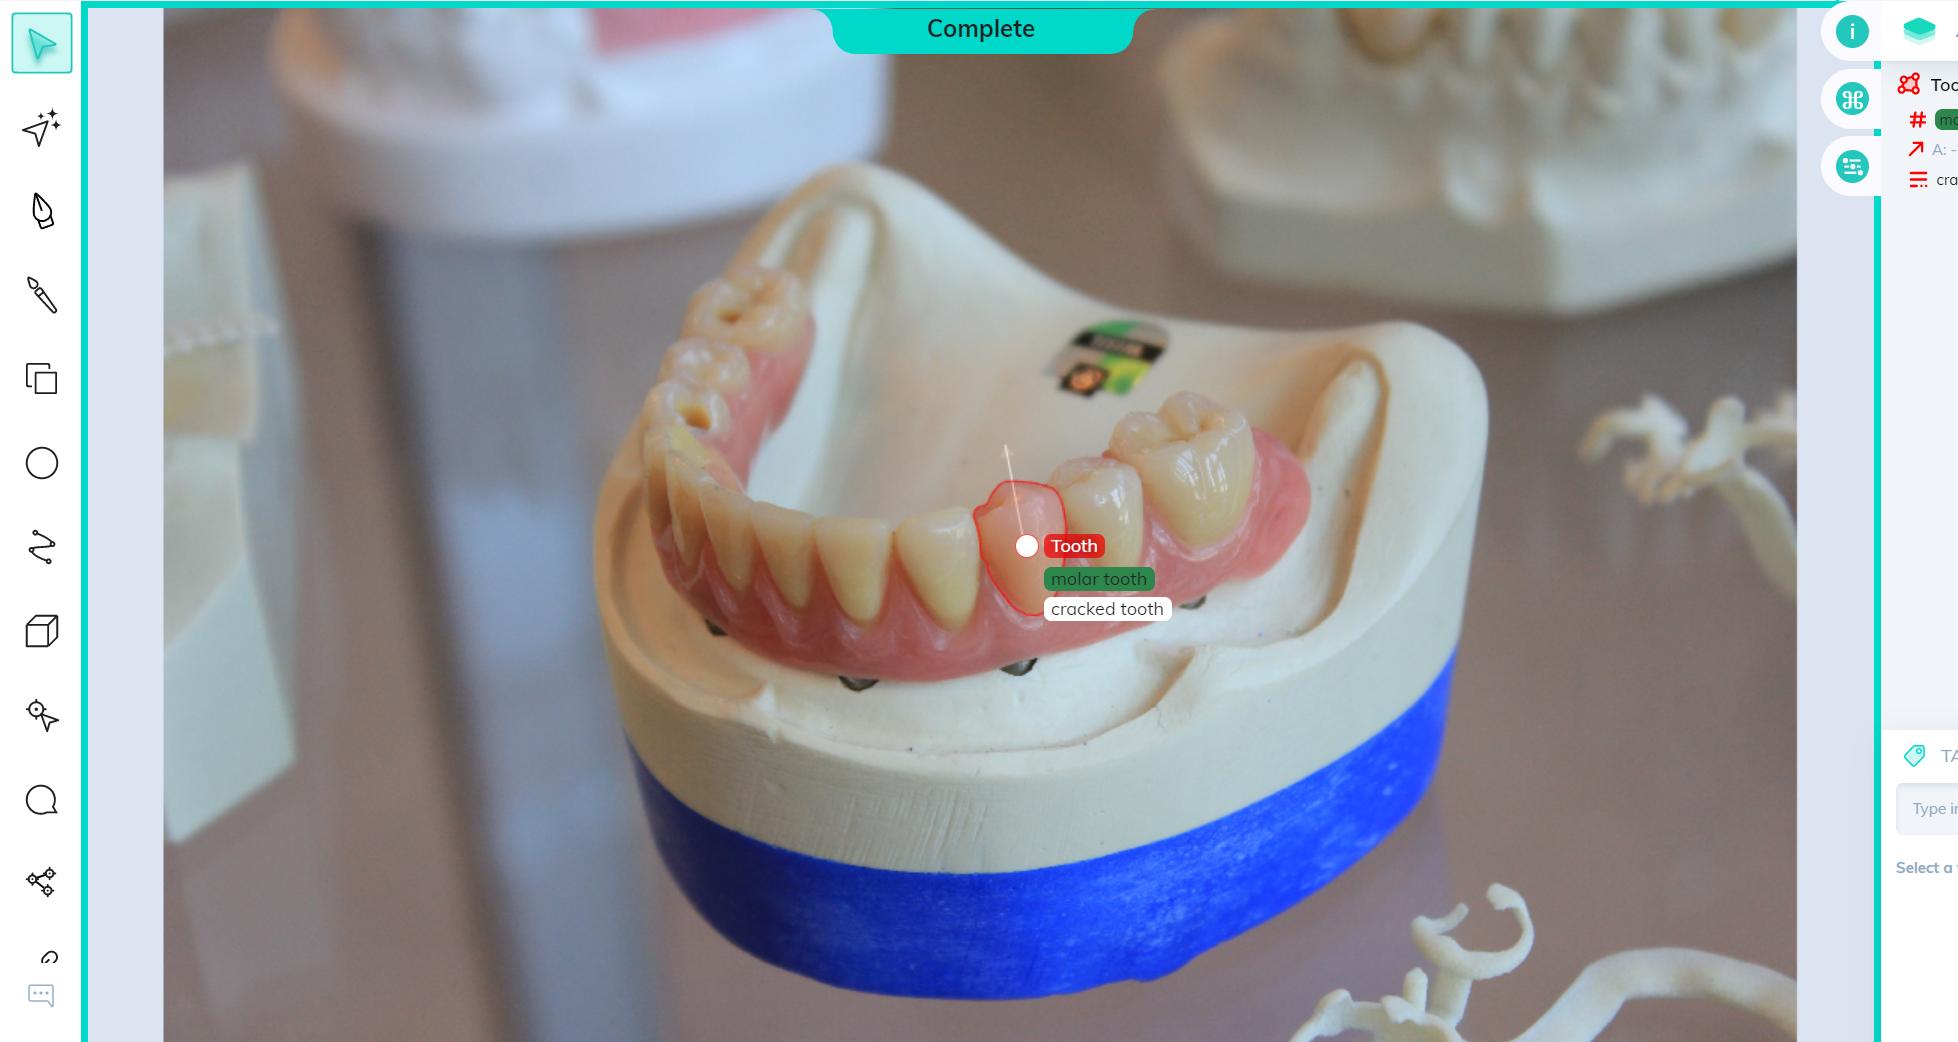 Dental image annotation